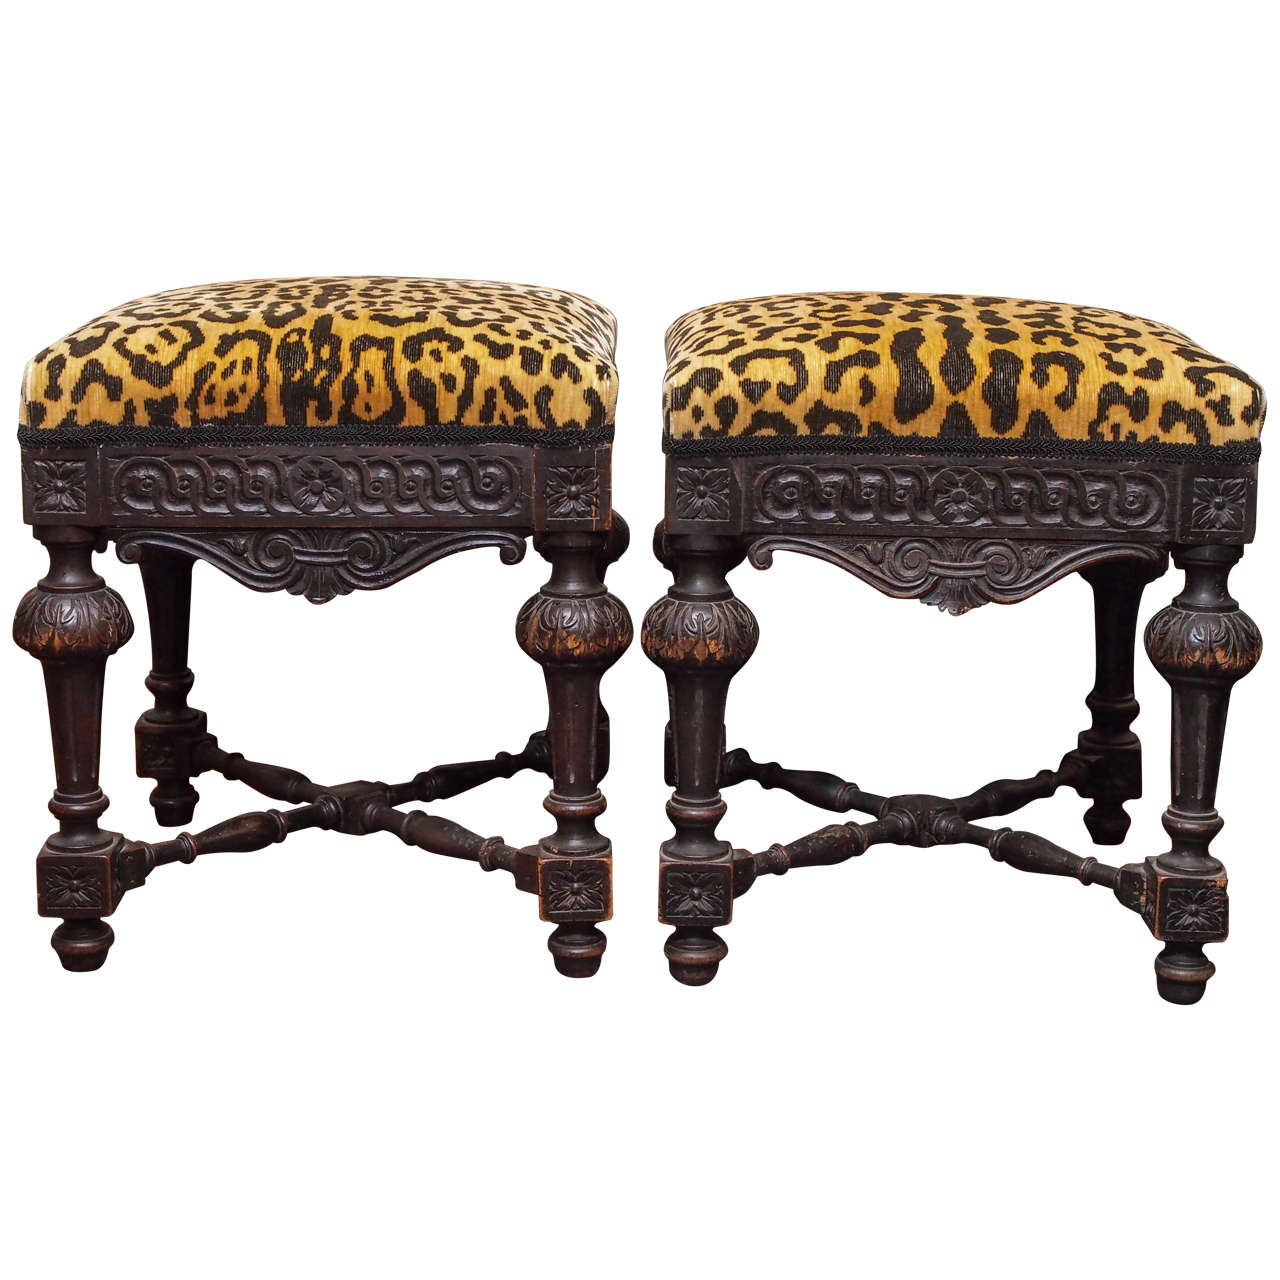 Pair of Italian walnut stools, 19th century